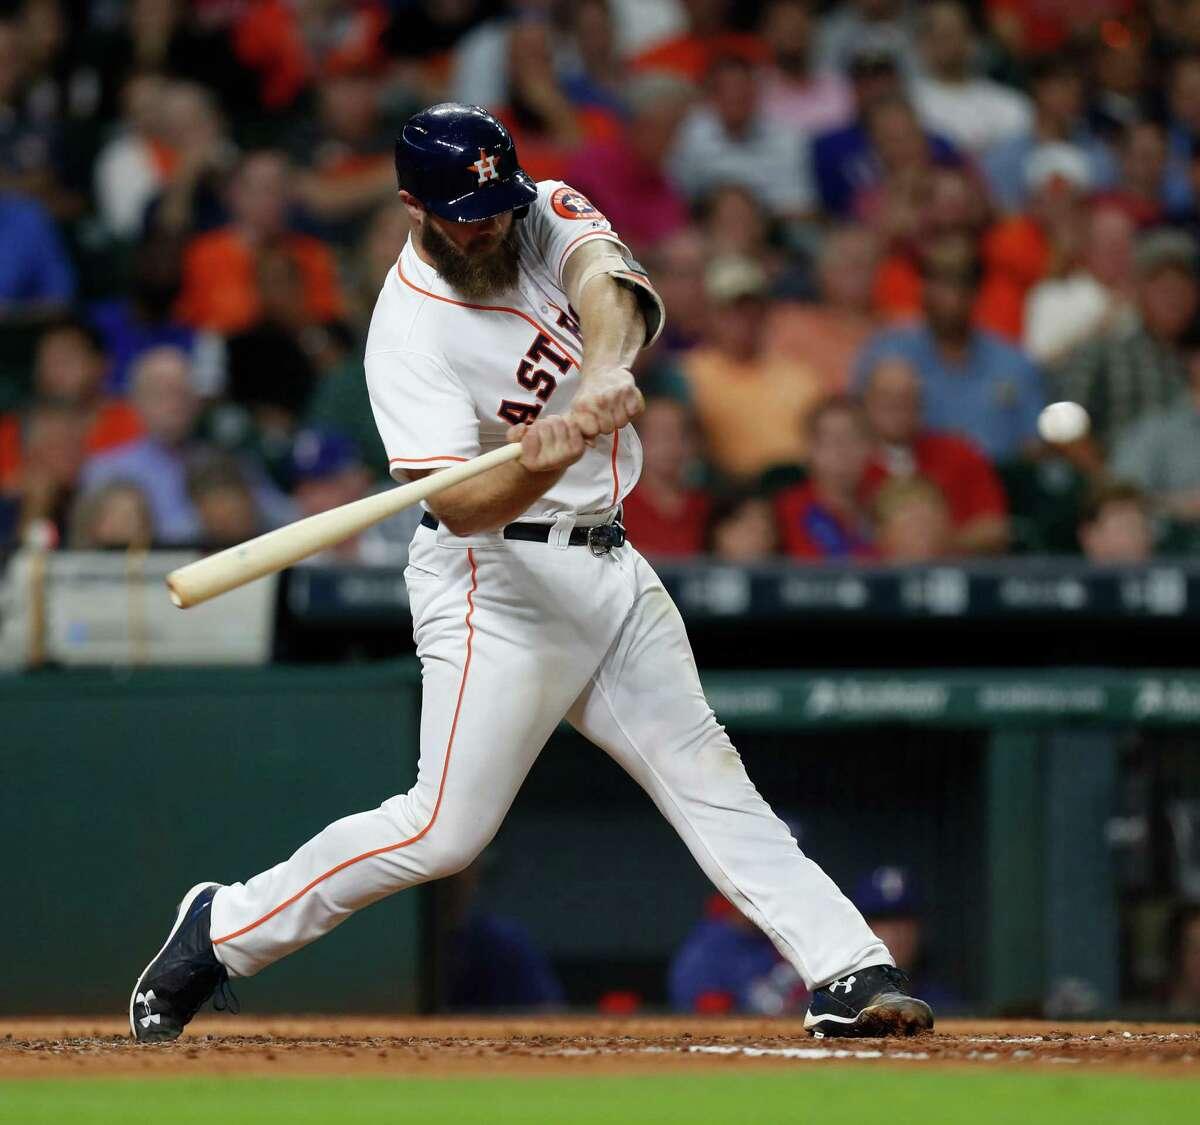 Houston Astros designated hitter Evan Gattis (11) flies out to Texas Rangers center fielder Carlos Gomez (14) during the fourth inning of an MLB game at Minute Maid Park, Wednesday, Sept. 14, 2016 in Houston. ( Karen Warren / Houston Chronicle )